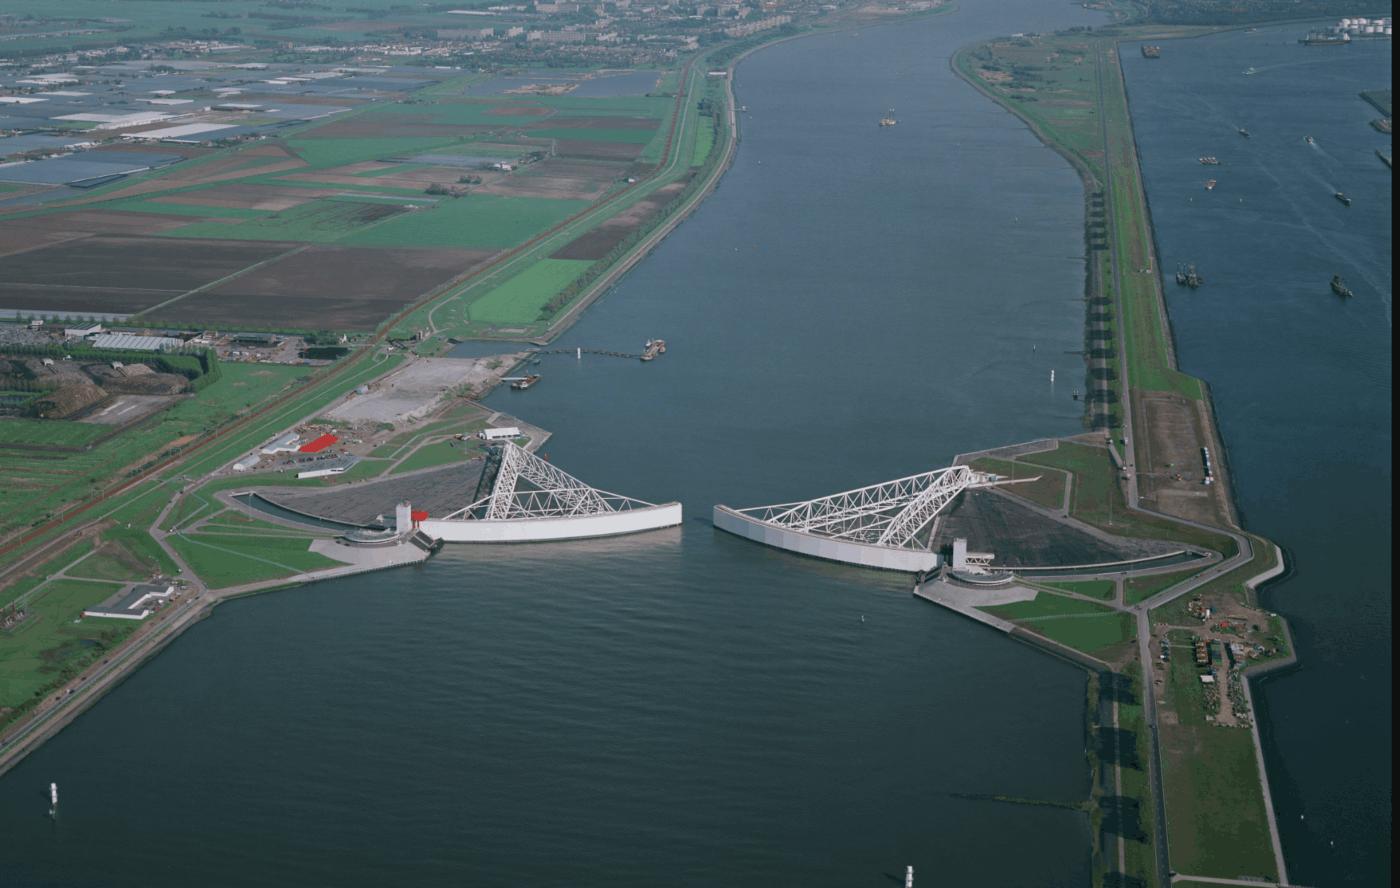 Maeskantkering storm surge barrier near Rotterdam (photo: Bart van Eyck)